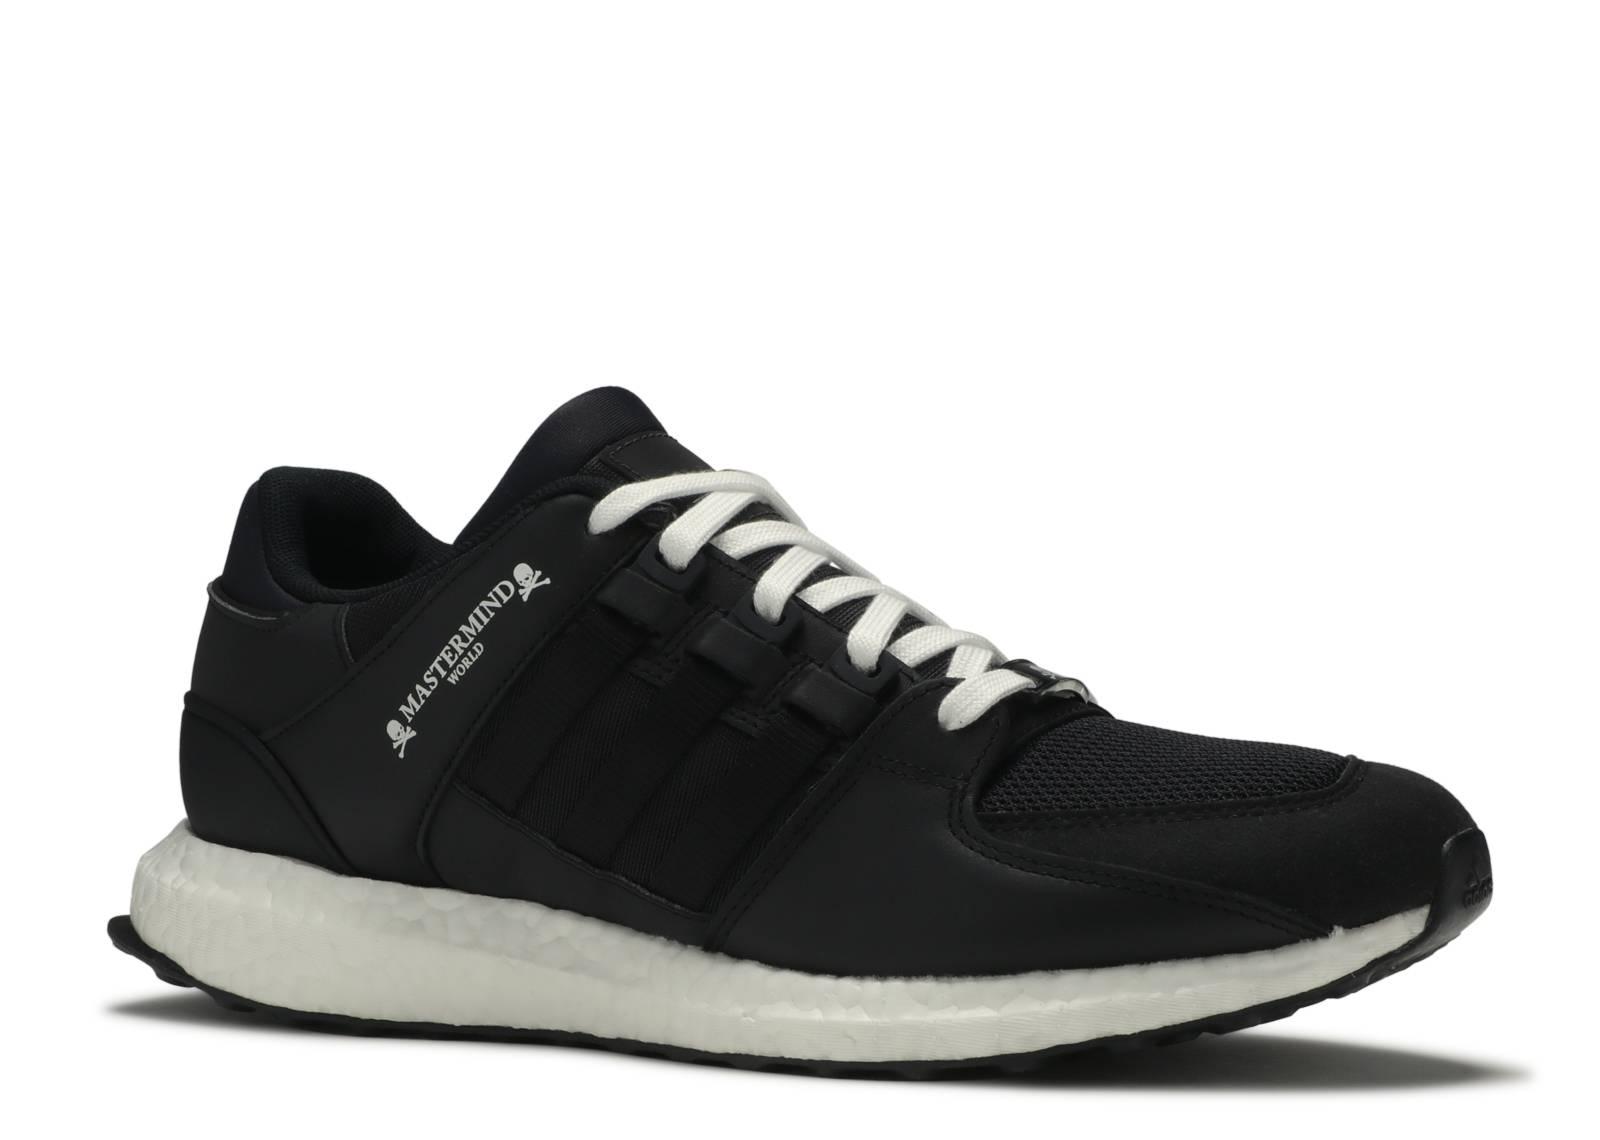 the best attitude fea57 d34b8 Adidas EQT Support Ultra Mastermind Black - 1